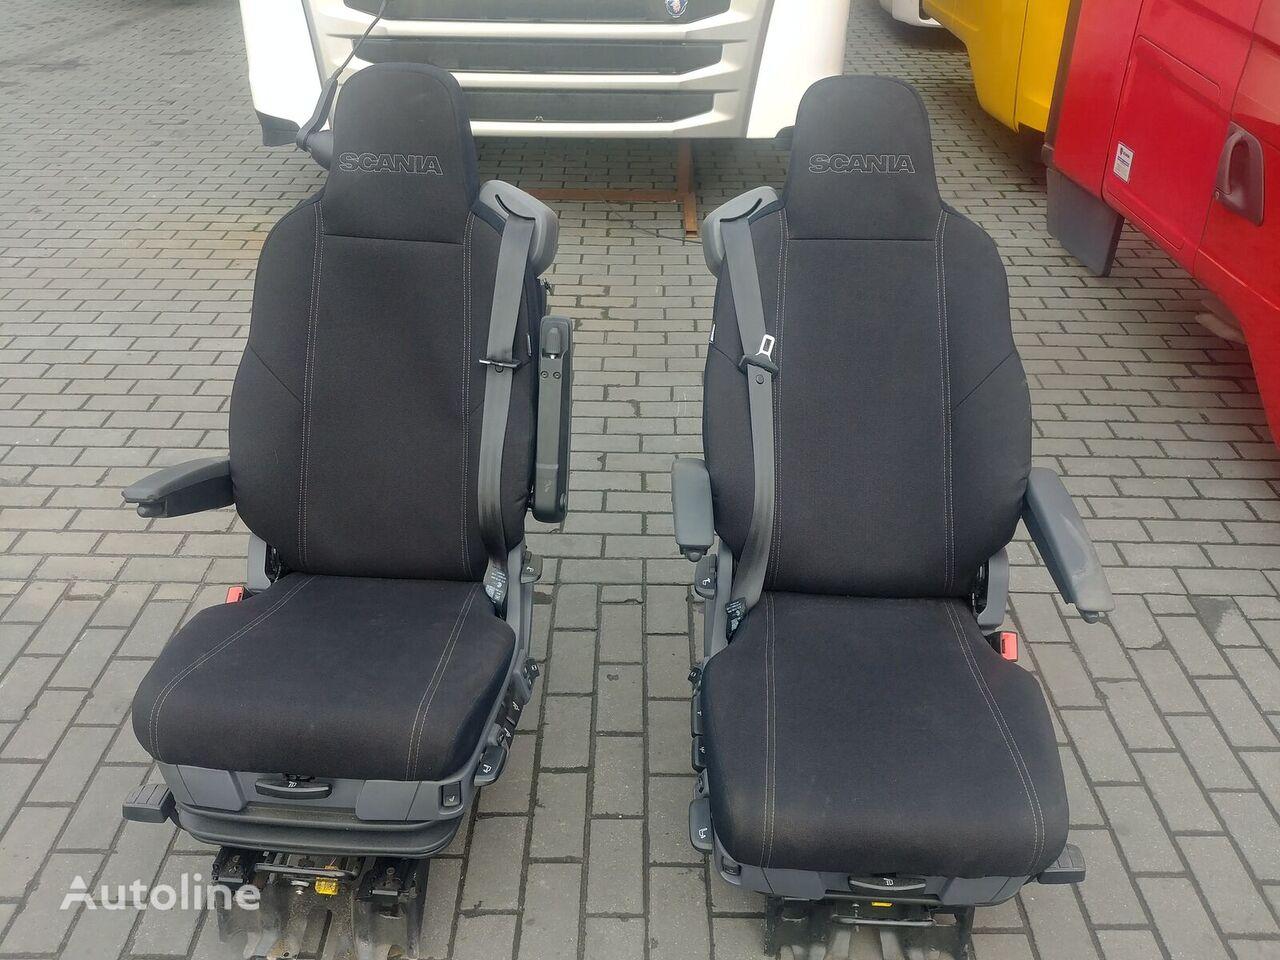 asiento para SCANIA tractora